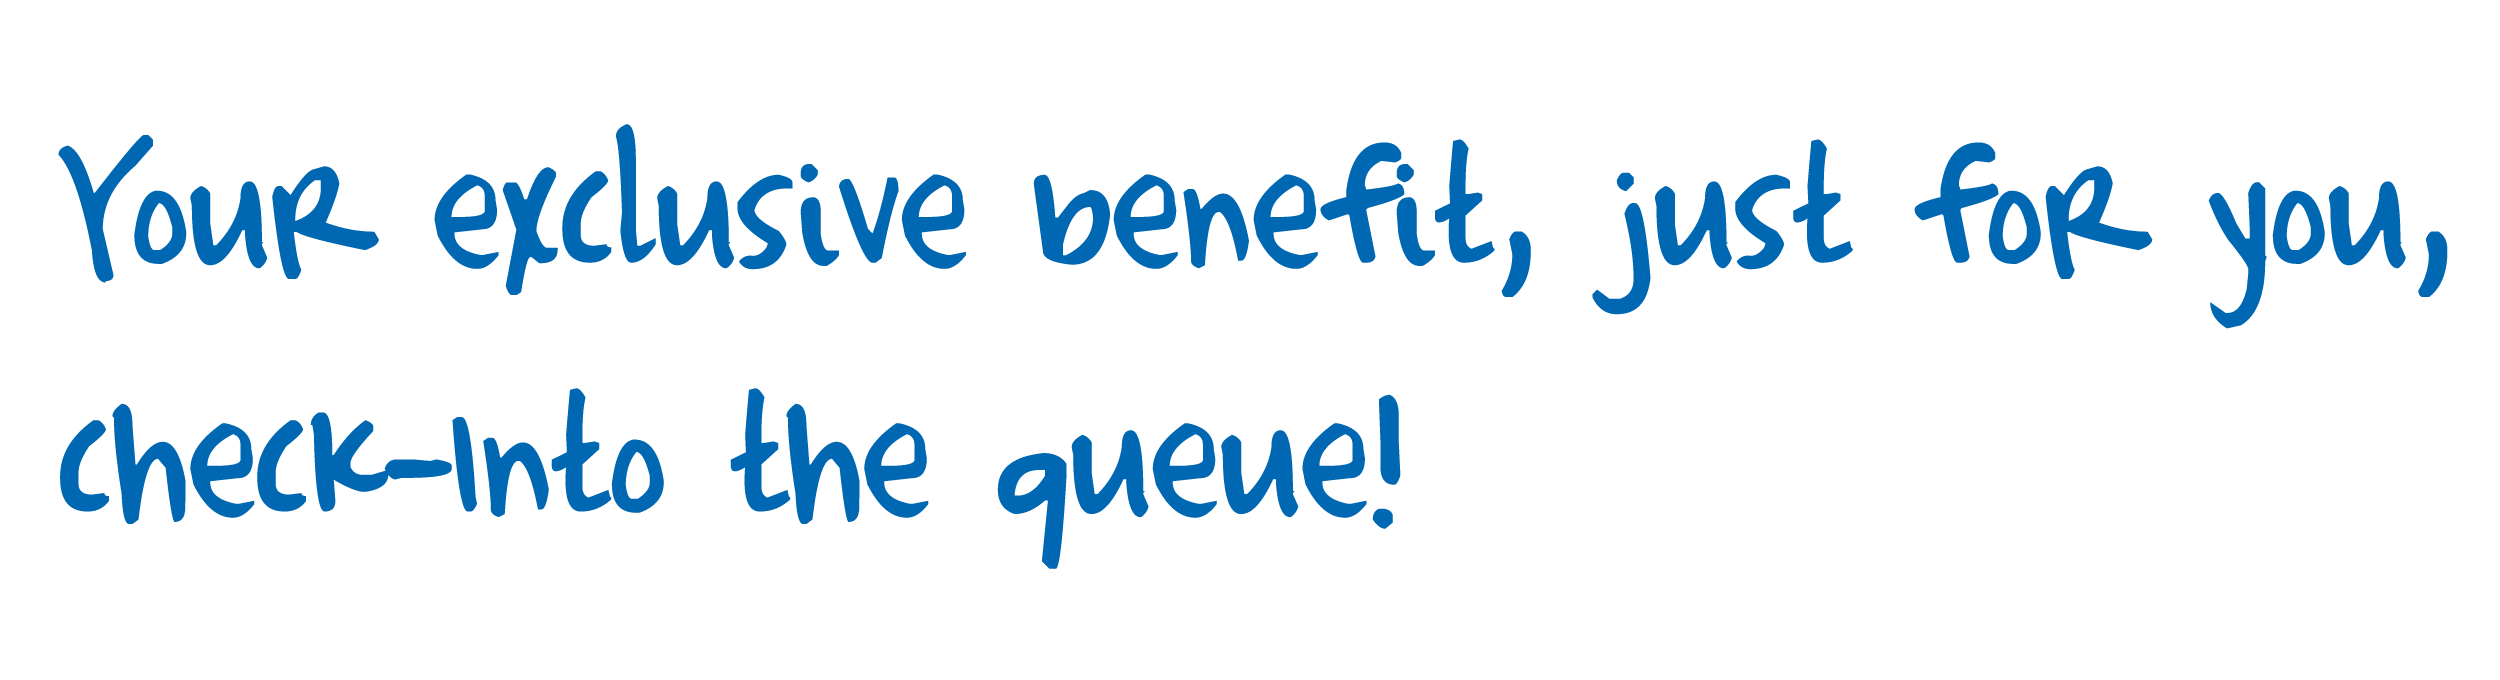 Your exclusive benefit